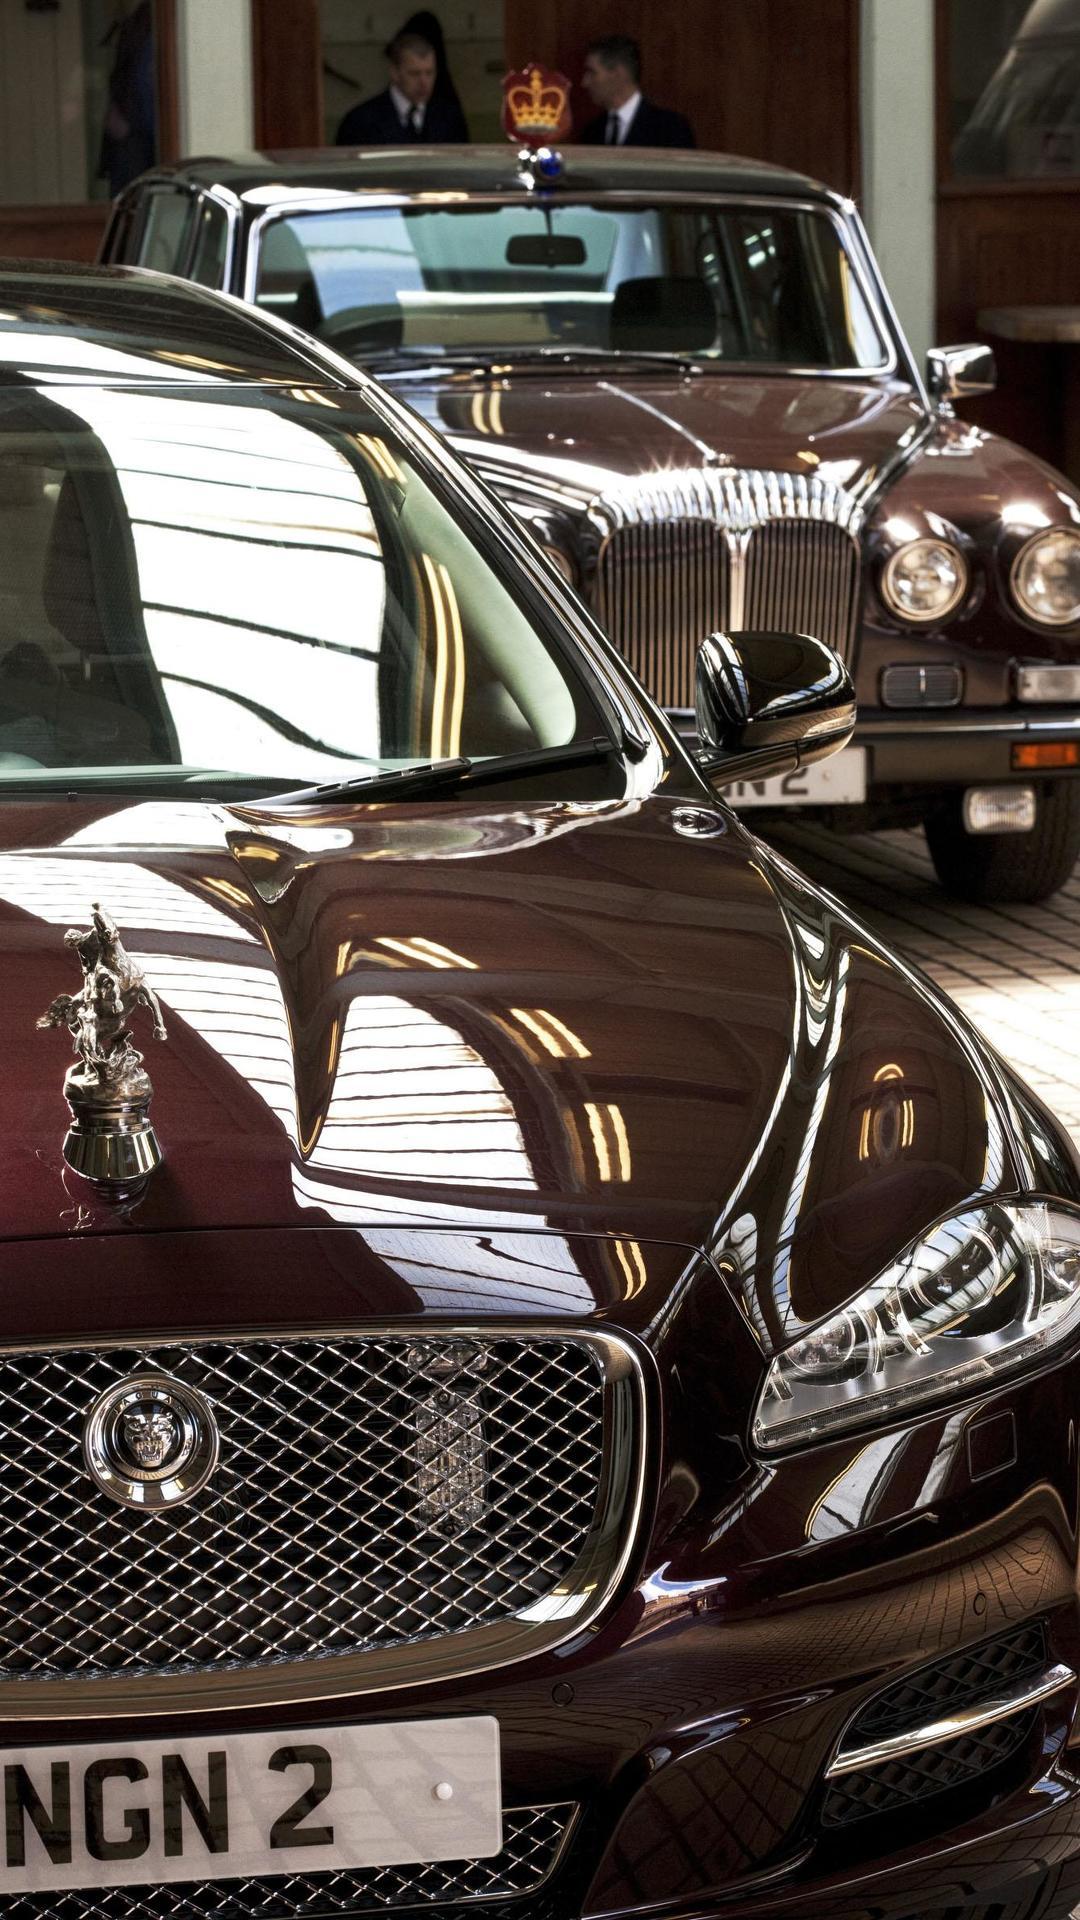 Jaguar Xj Lwb Semi State Limousine 09 7 2013 Motor1 Com Photos